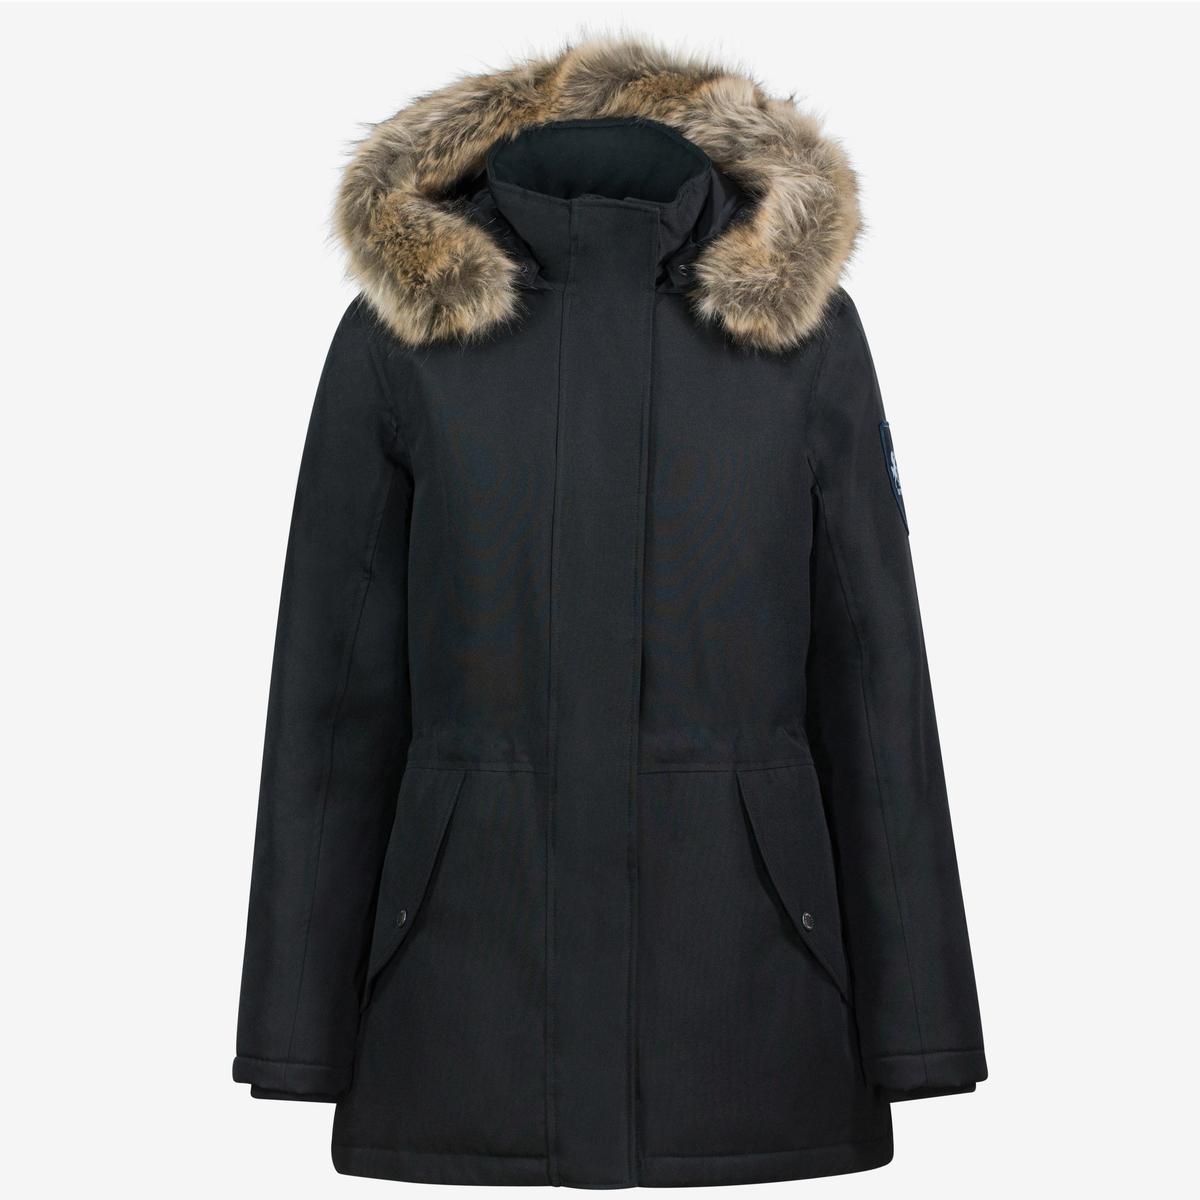 7d3e4b21 B Vertigo Estella lang jakke, dame   Horze